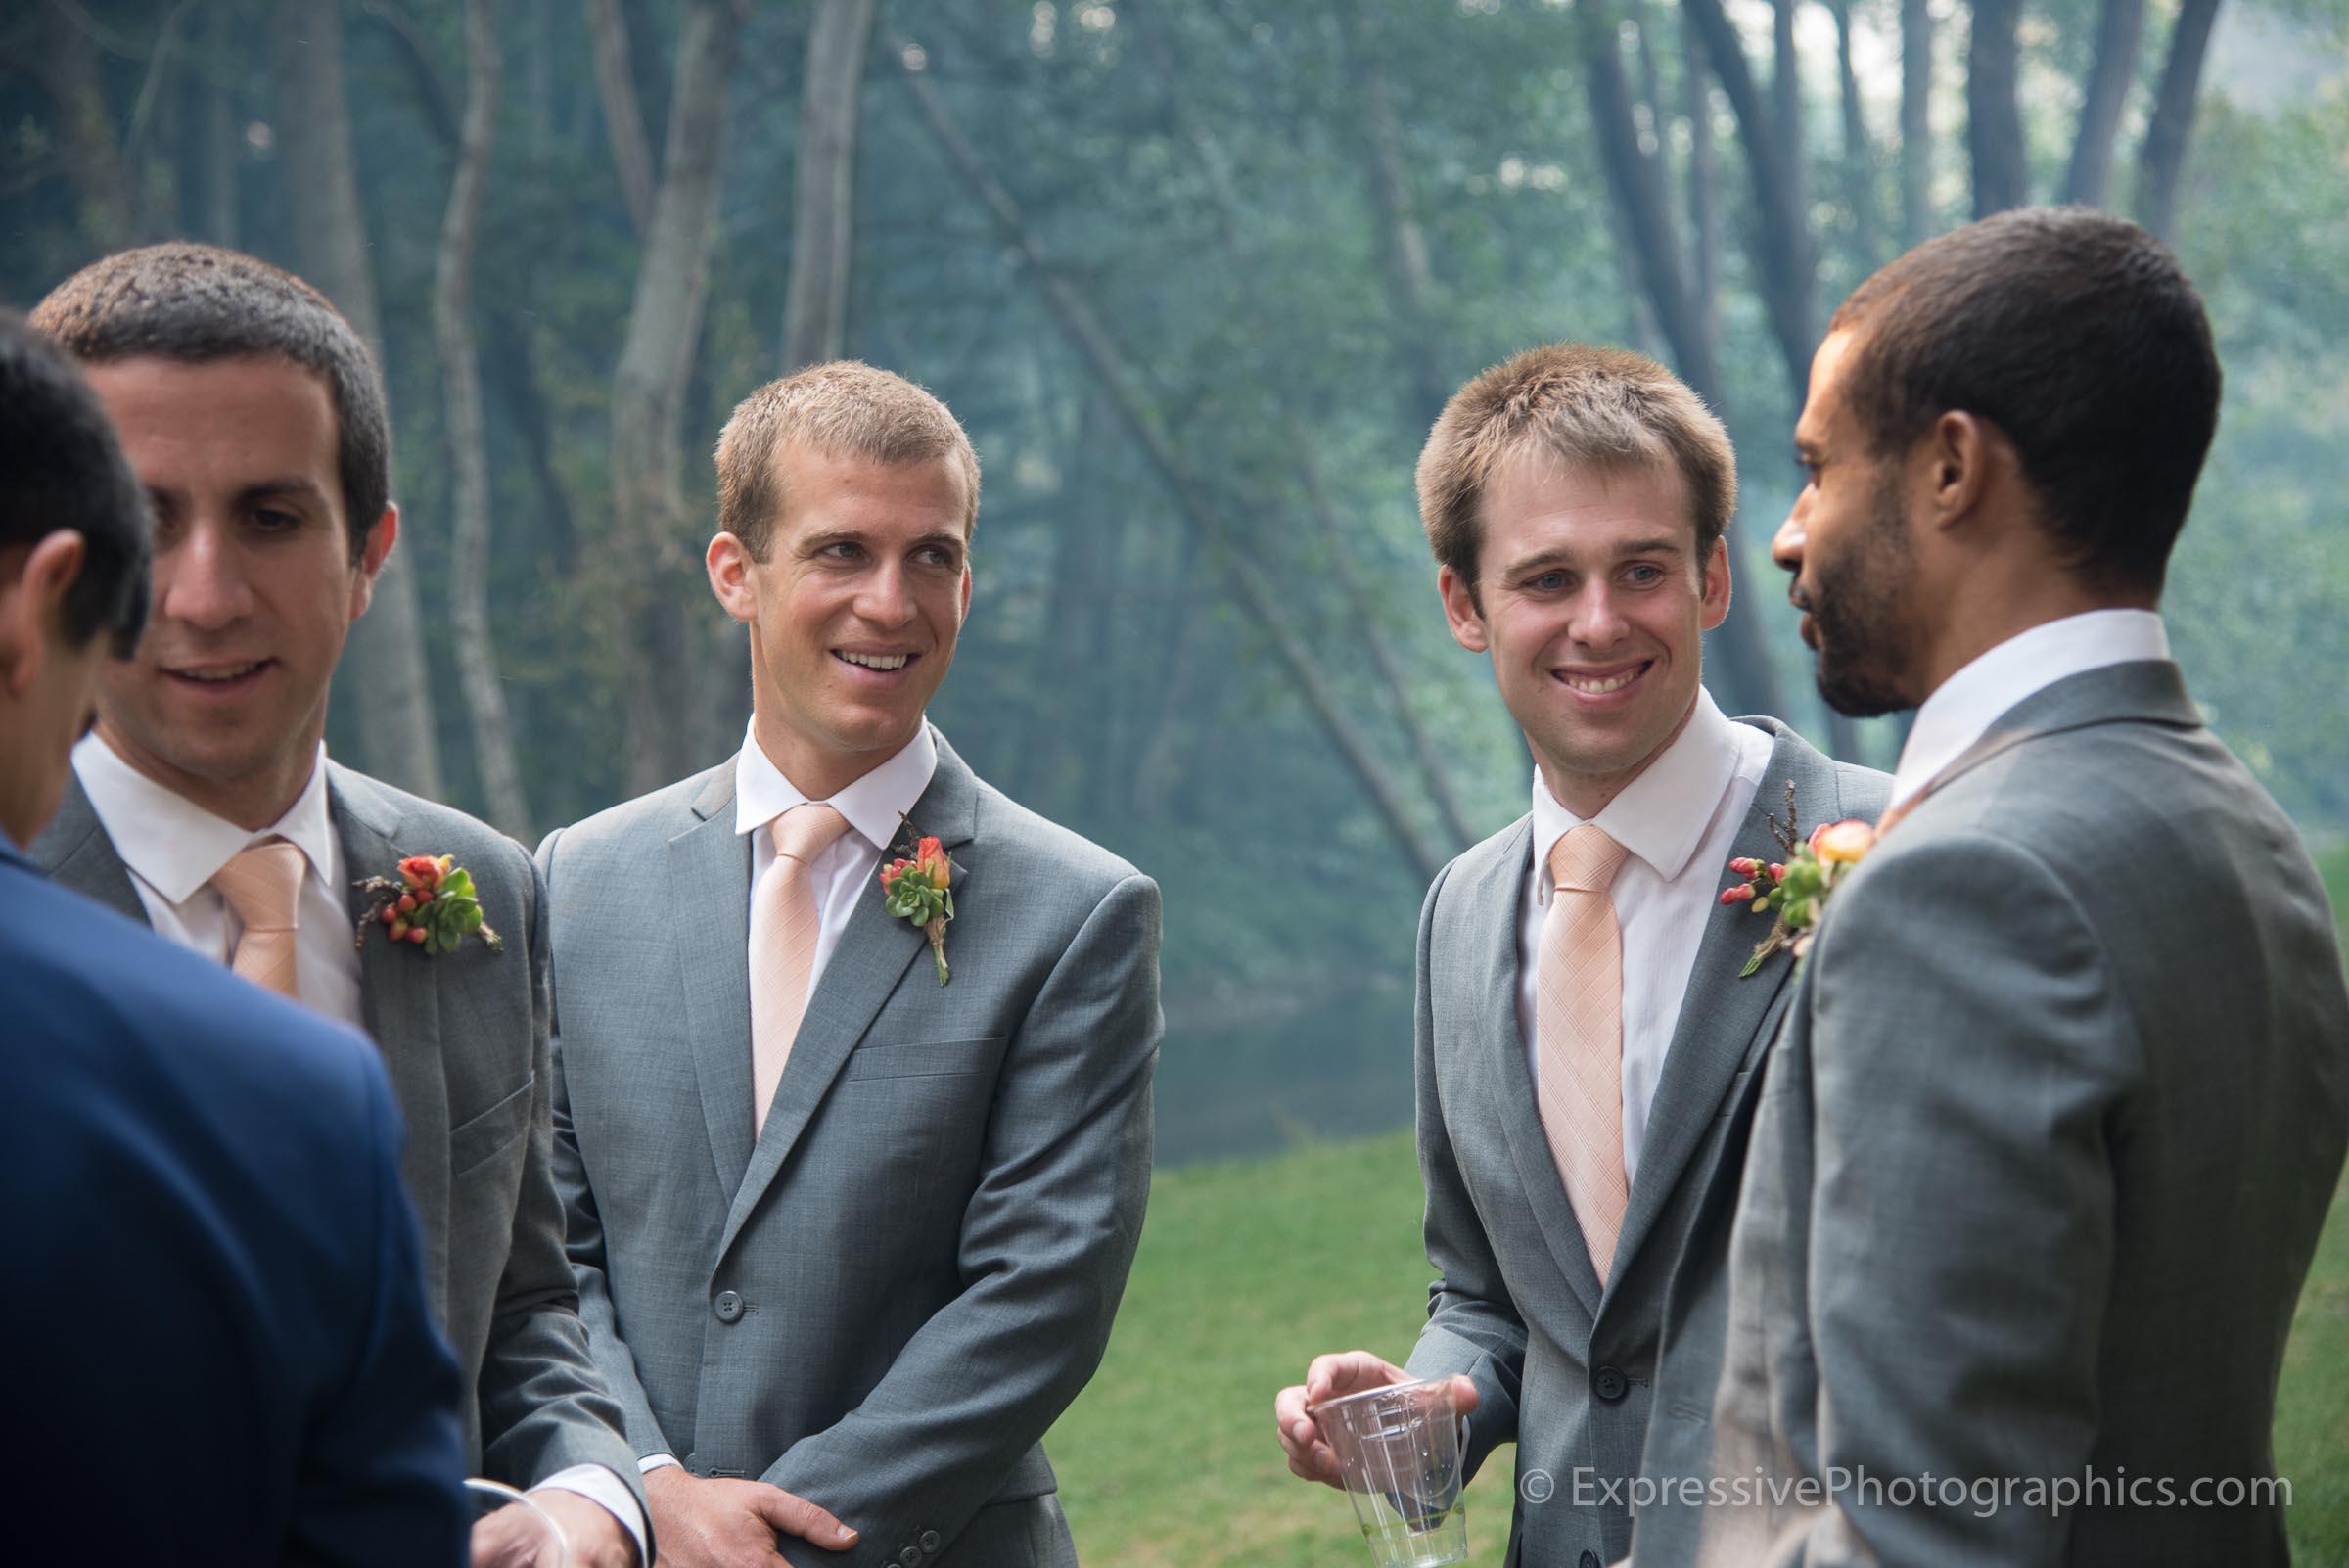 Expressive-Photographics-groomsmen-20160723_0790.jpg